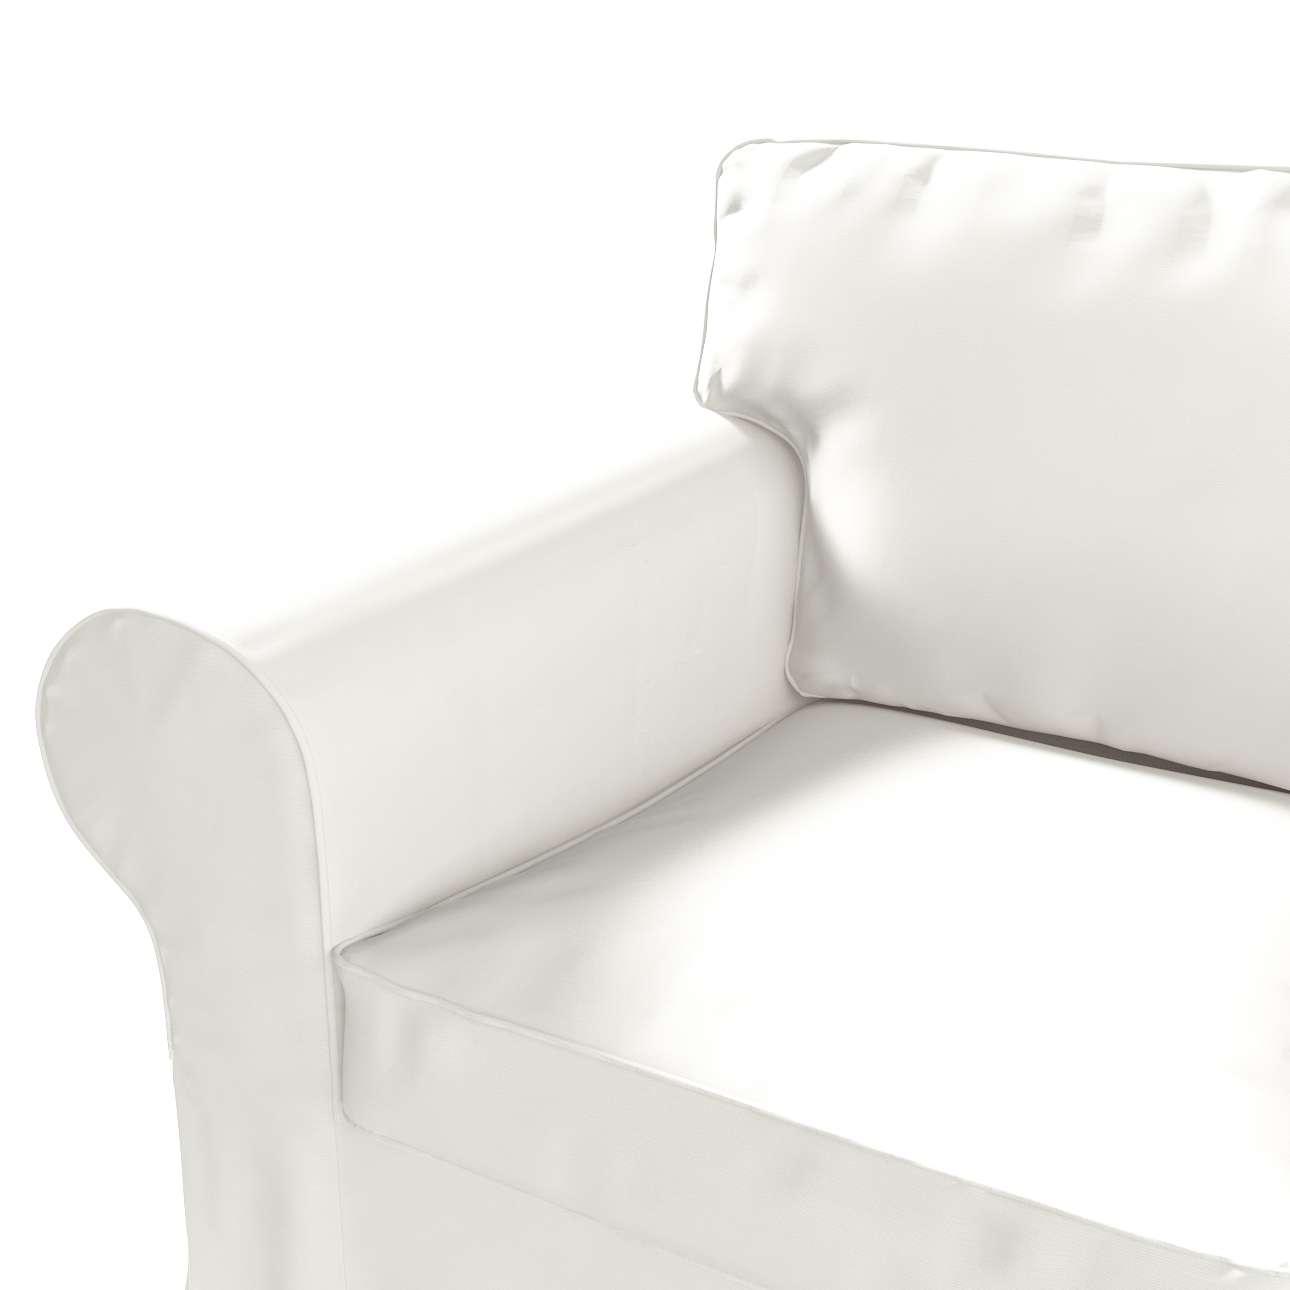 Ektorp Sesselbezug von der Kollektion Cotton Panama, Stoff: 702-34